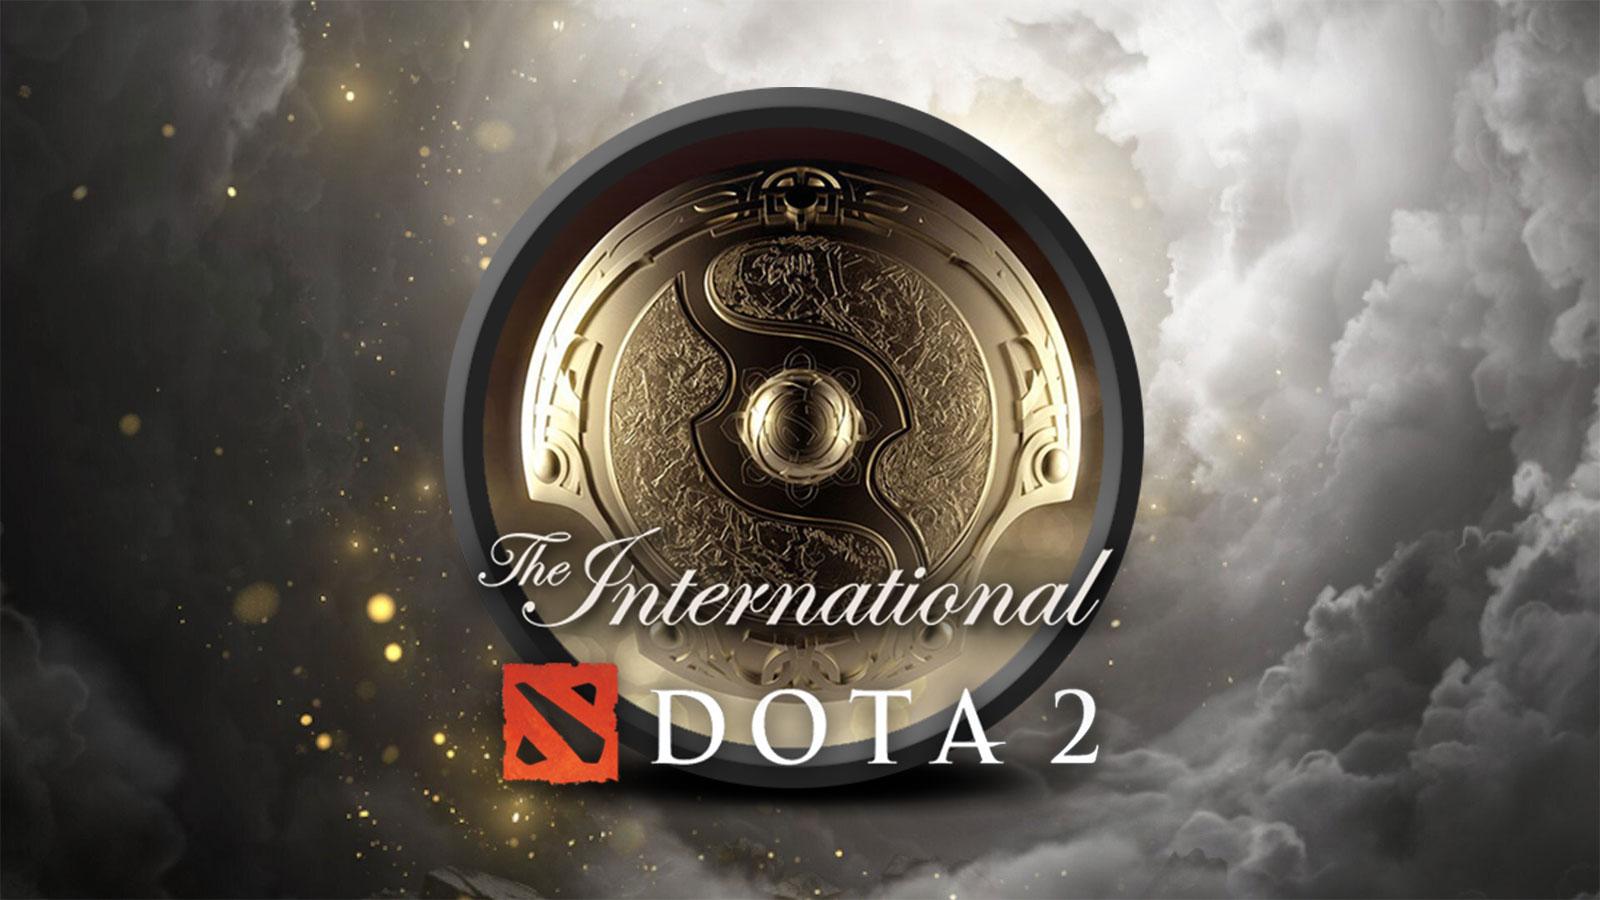 Dota 2 The International 2020